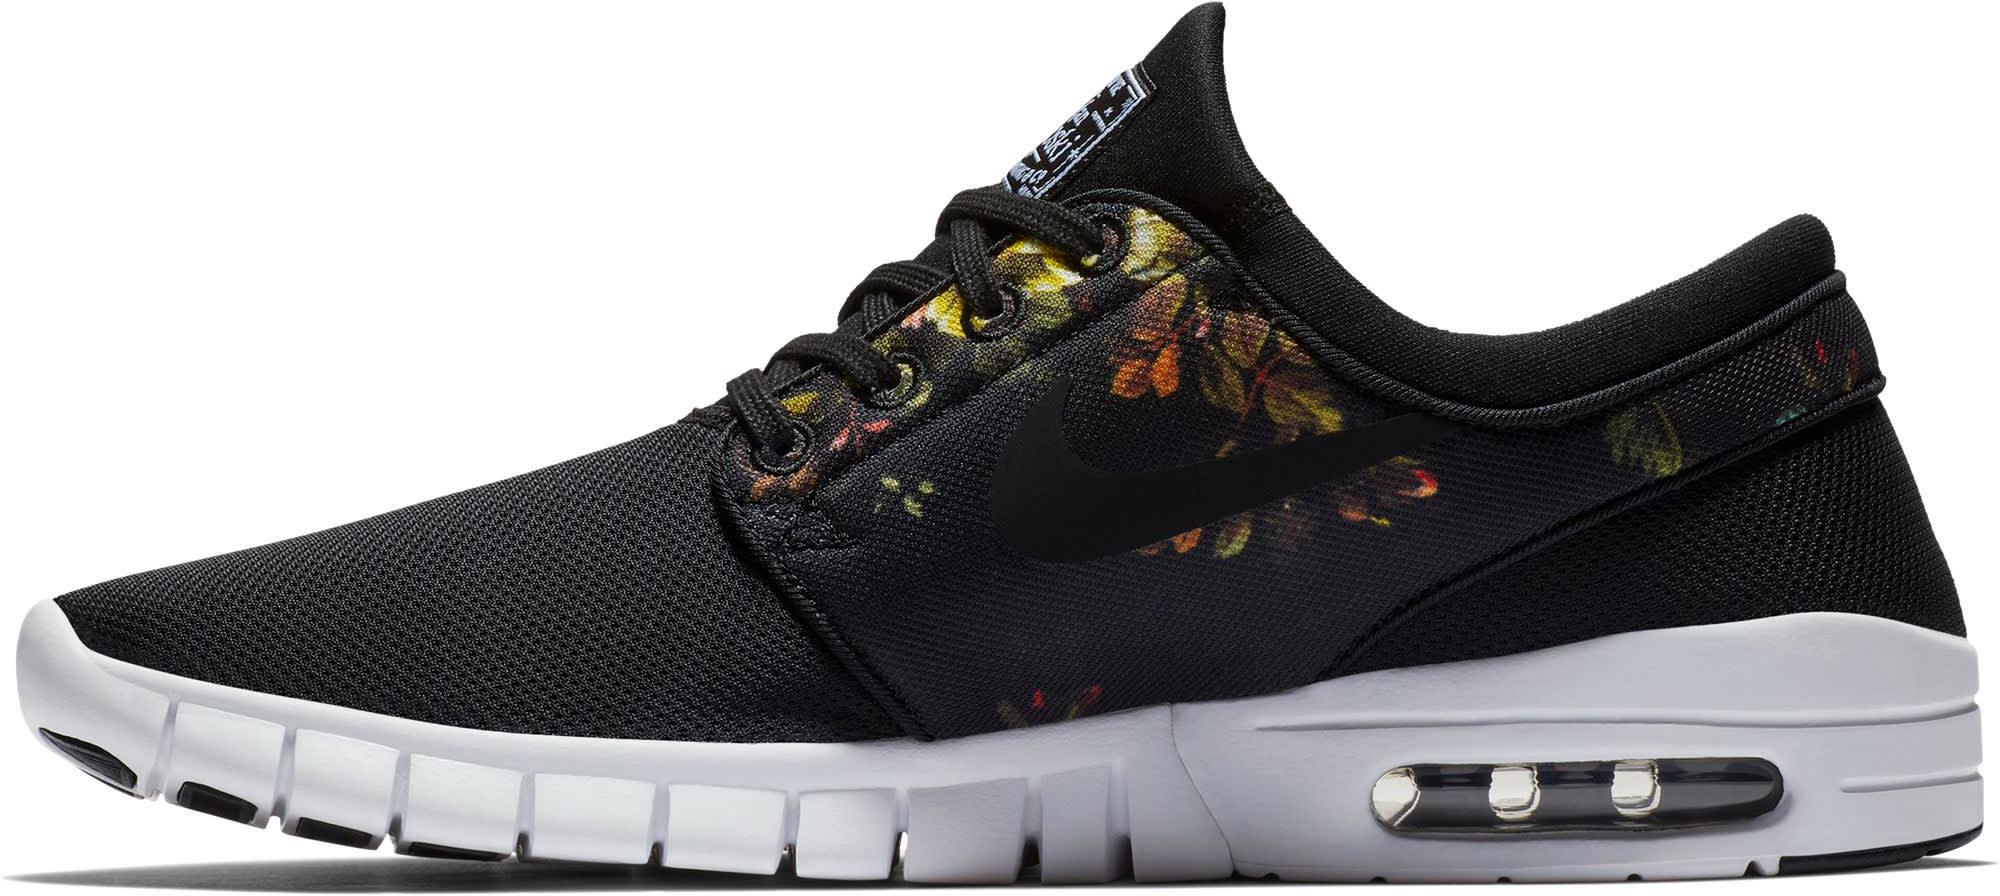 9f870b11c1eba Nike SB Stefan Janoski Max Skate Shoes - thumbnail 2